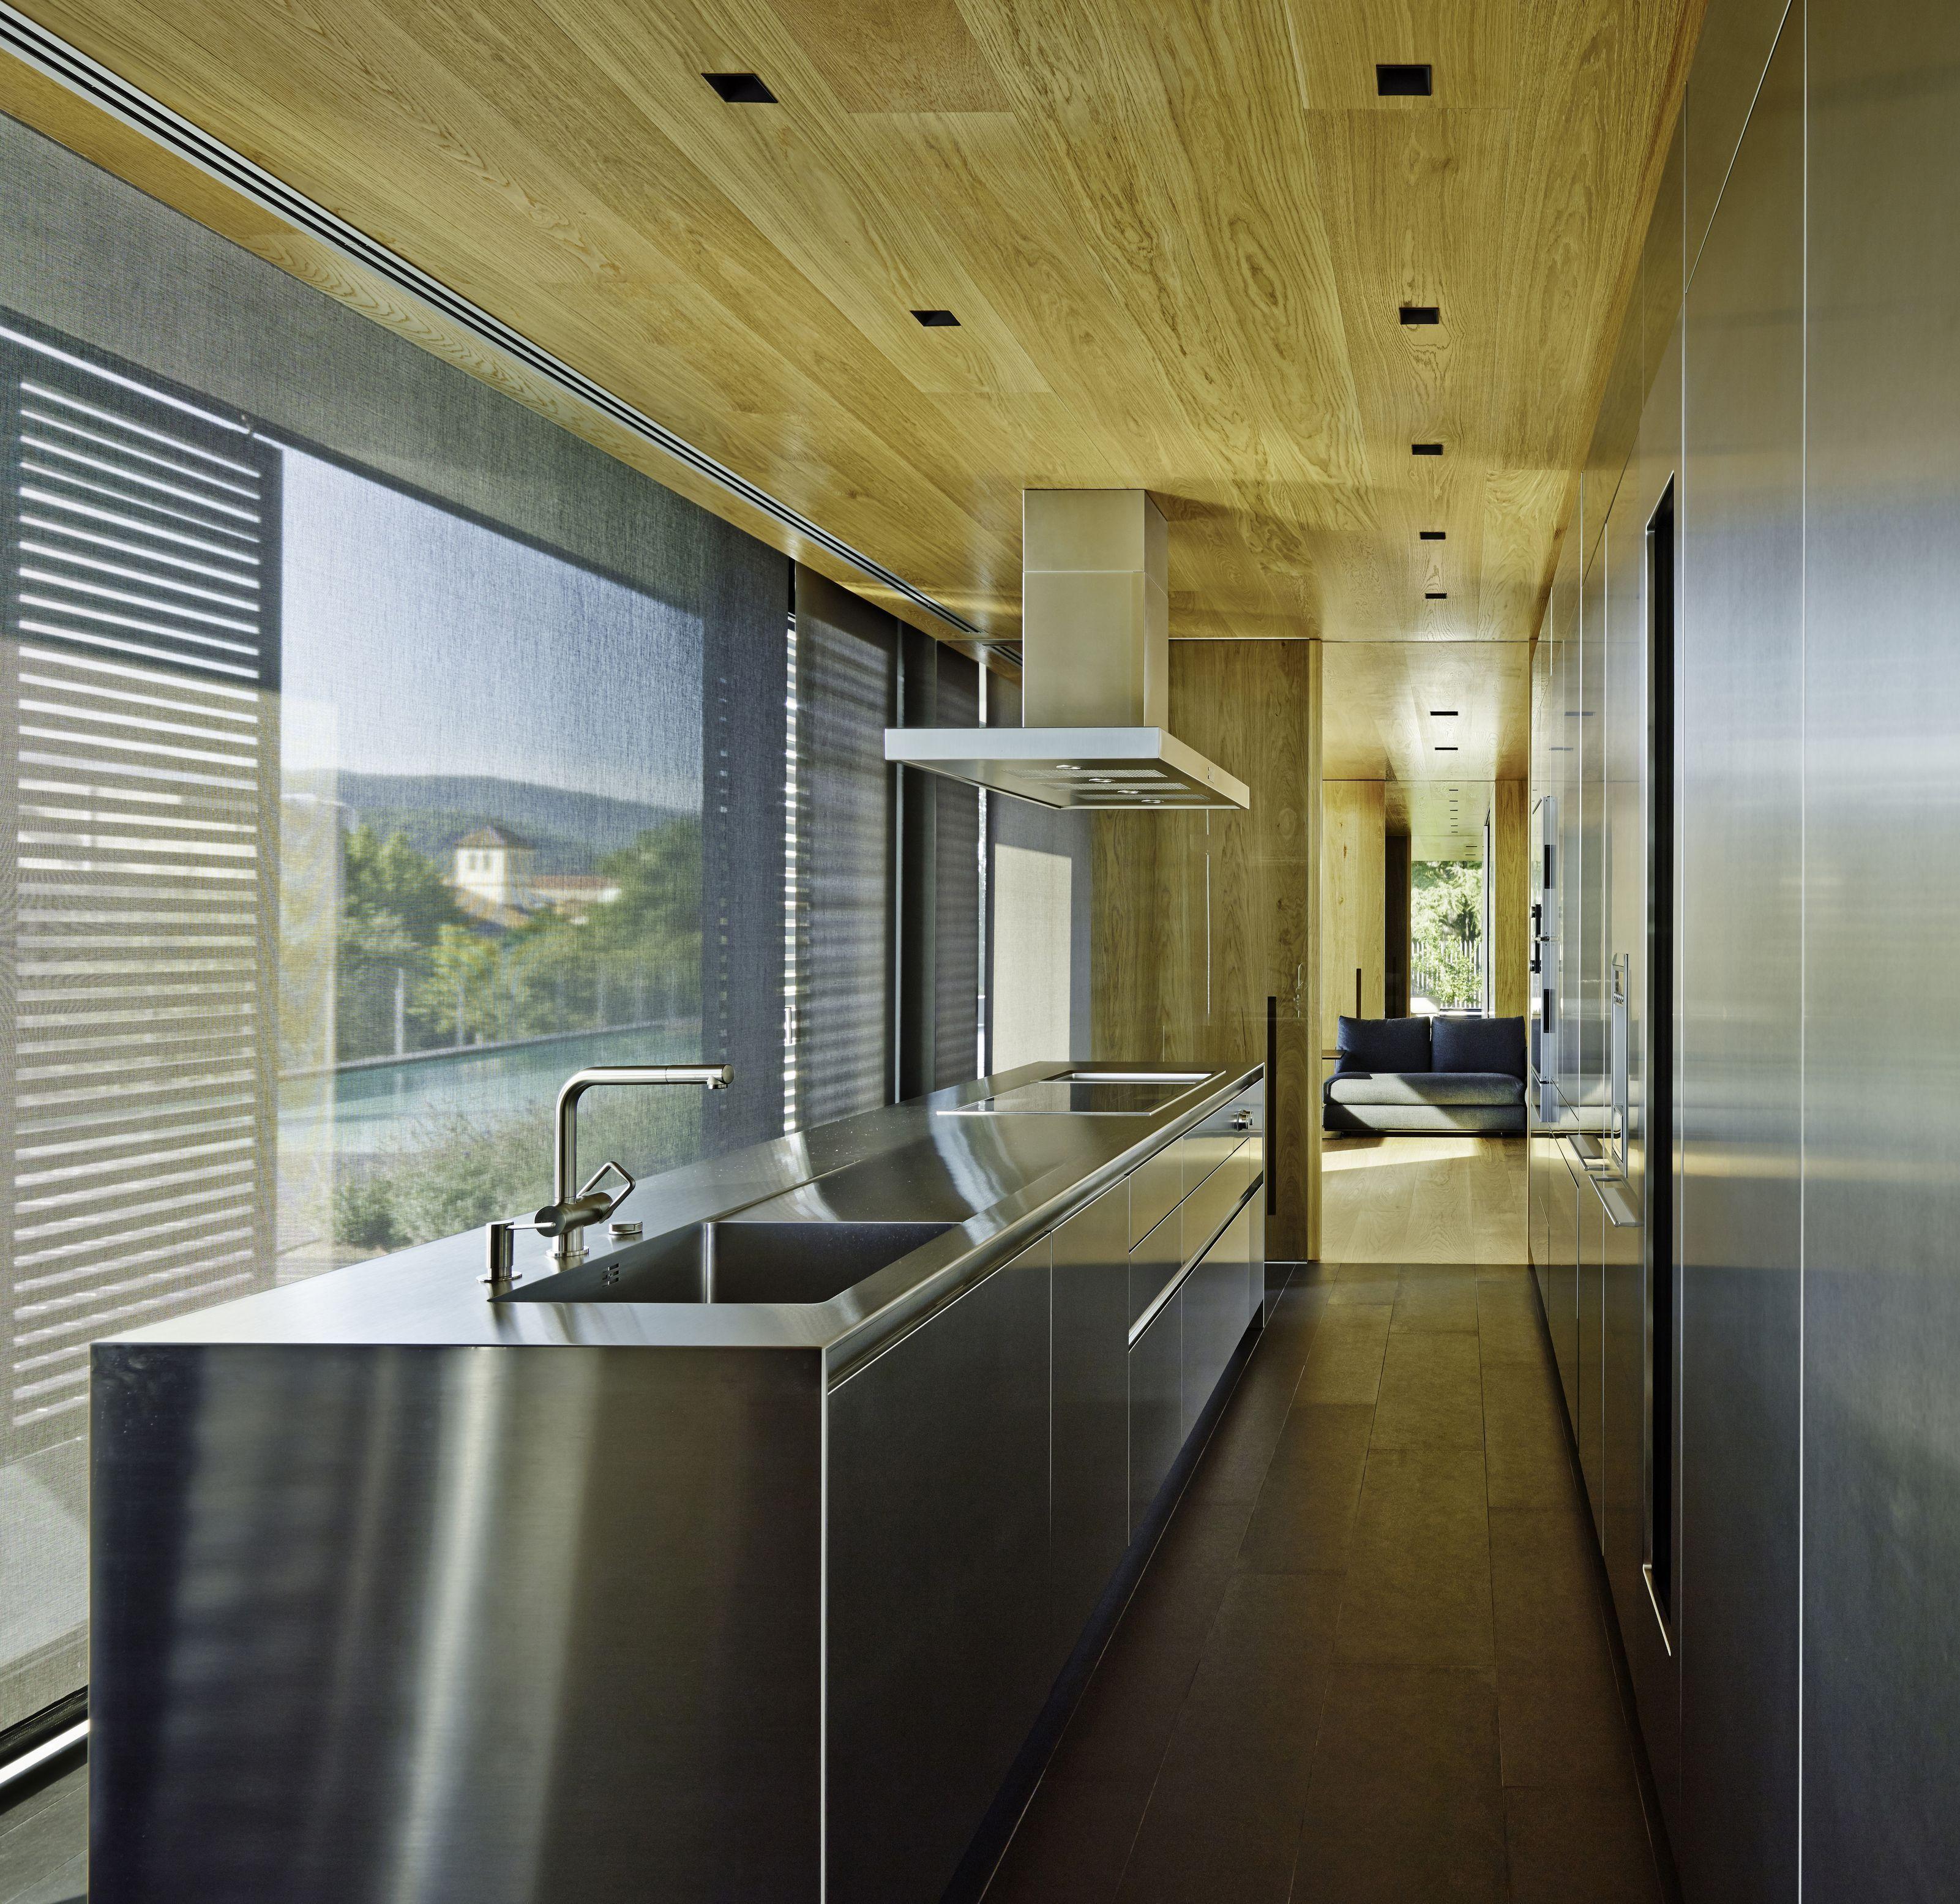 10 Fantastic Space Saving Galley Kitchen Ideas Galley Kitchen Layout Kitchen Layout Kitchen Ceiling Design